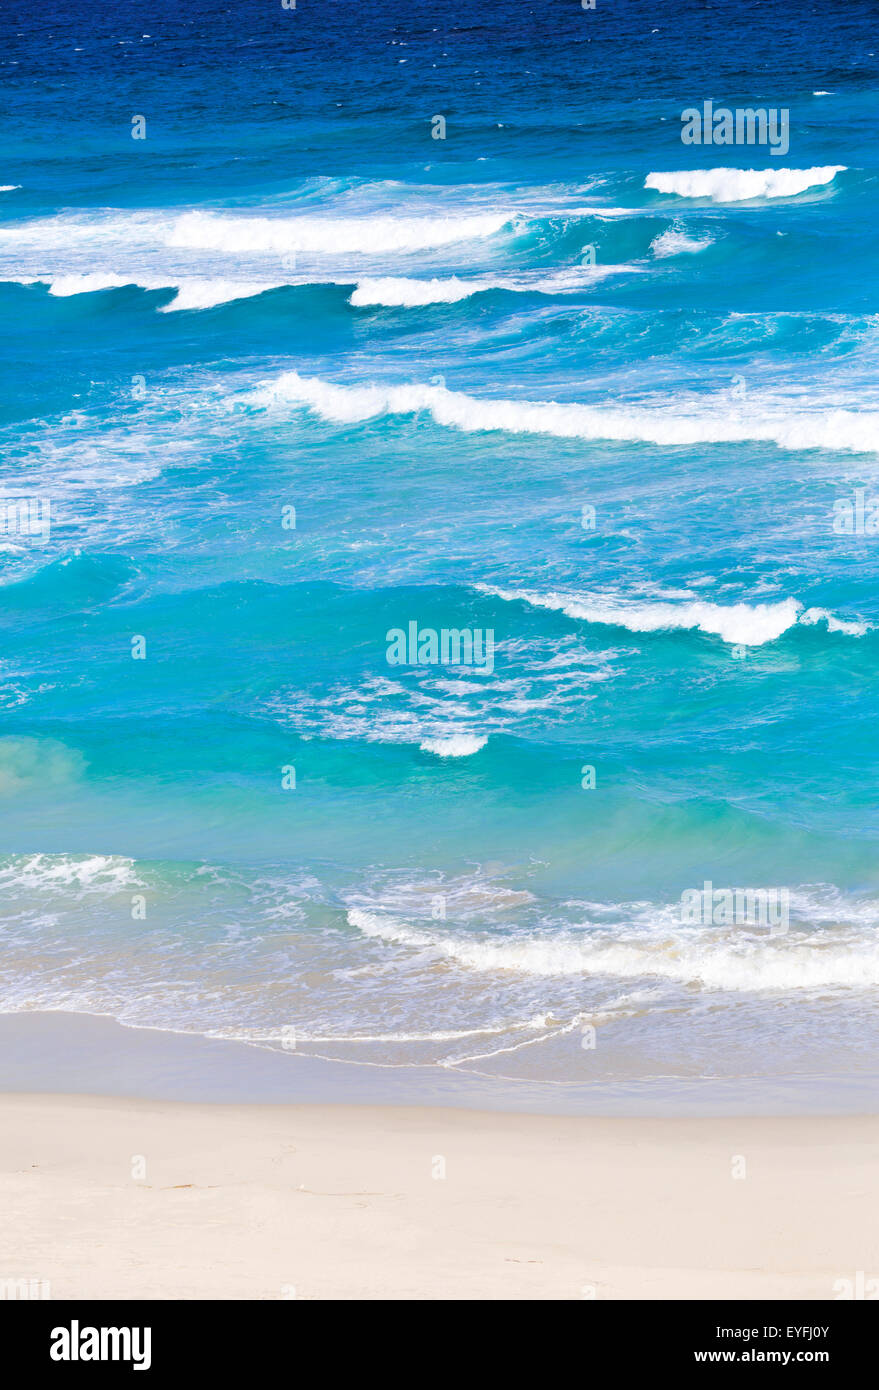 Olas rompiendo en la playa. Imagen De Stock